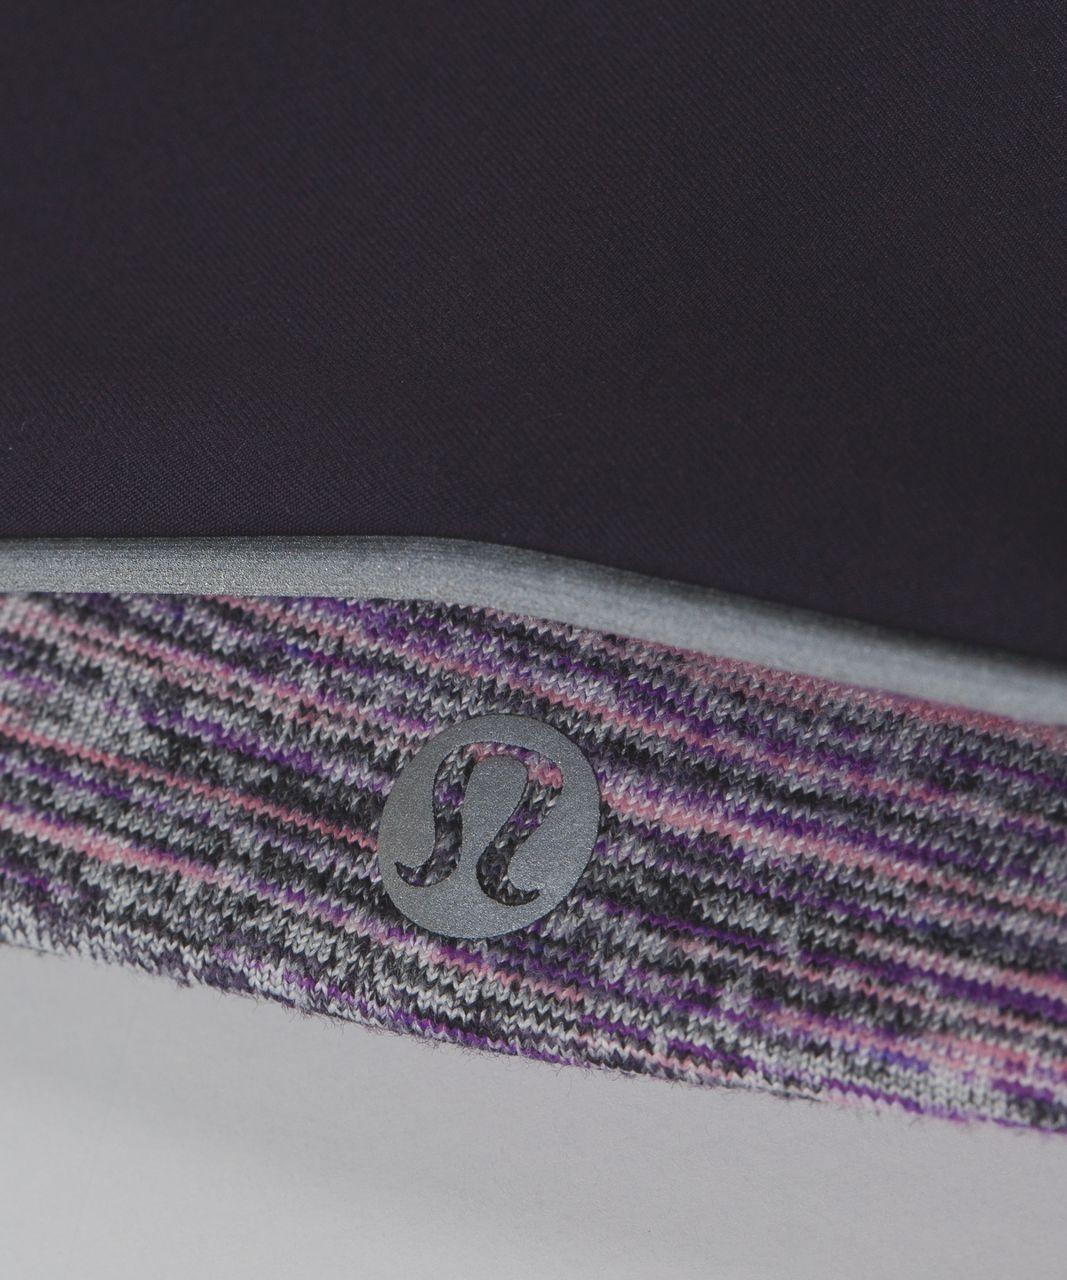 Lululemon Run And Done Ear Warmer *Softshell - Space Dye Camo Tender Violet Black Grape / Black Grape